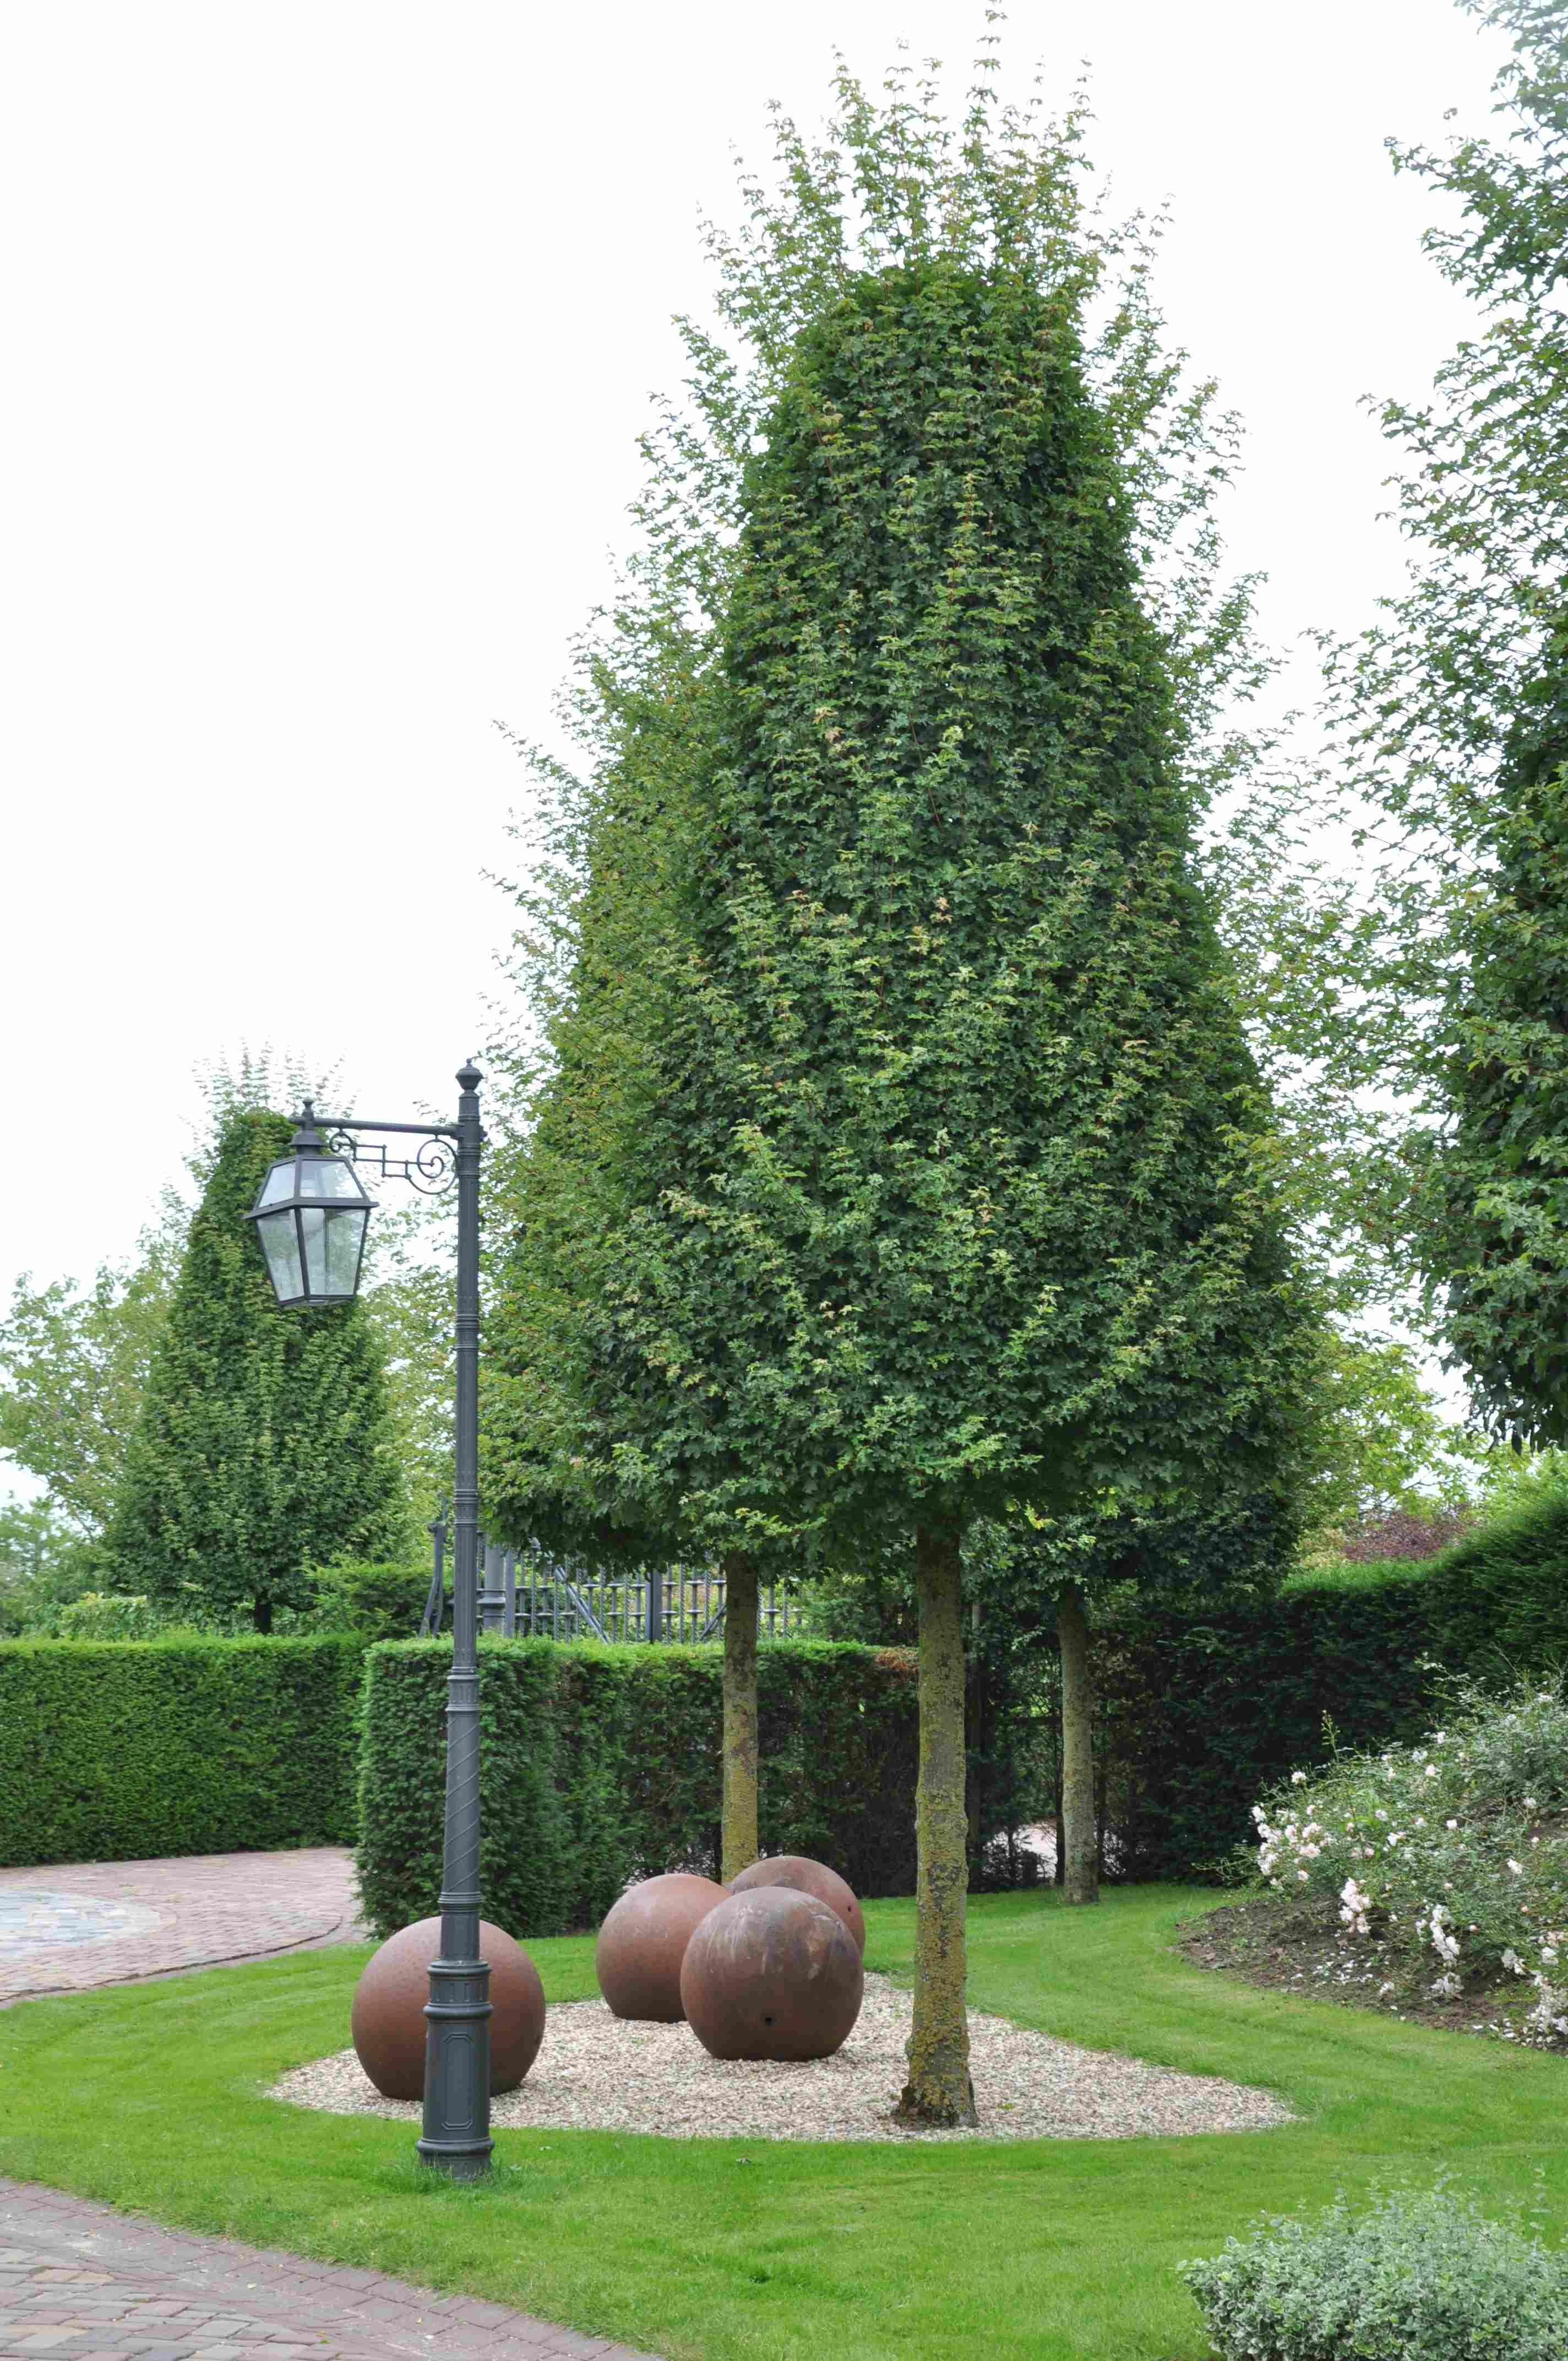 TrädgÃ¥rdsdesign – sida 6 – greenspire trädgÃ¥rdskonsult